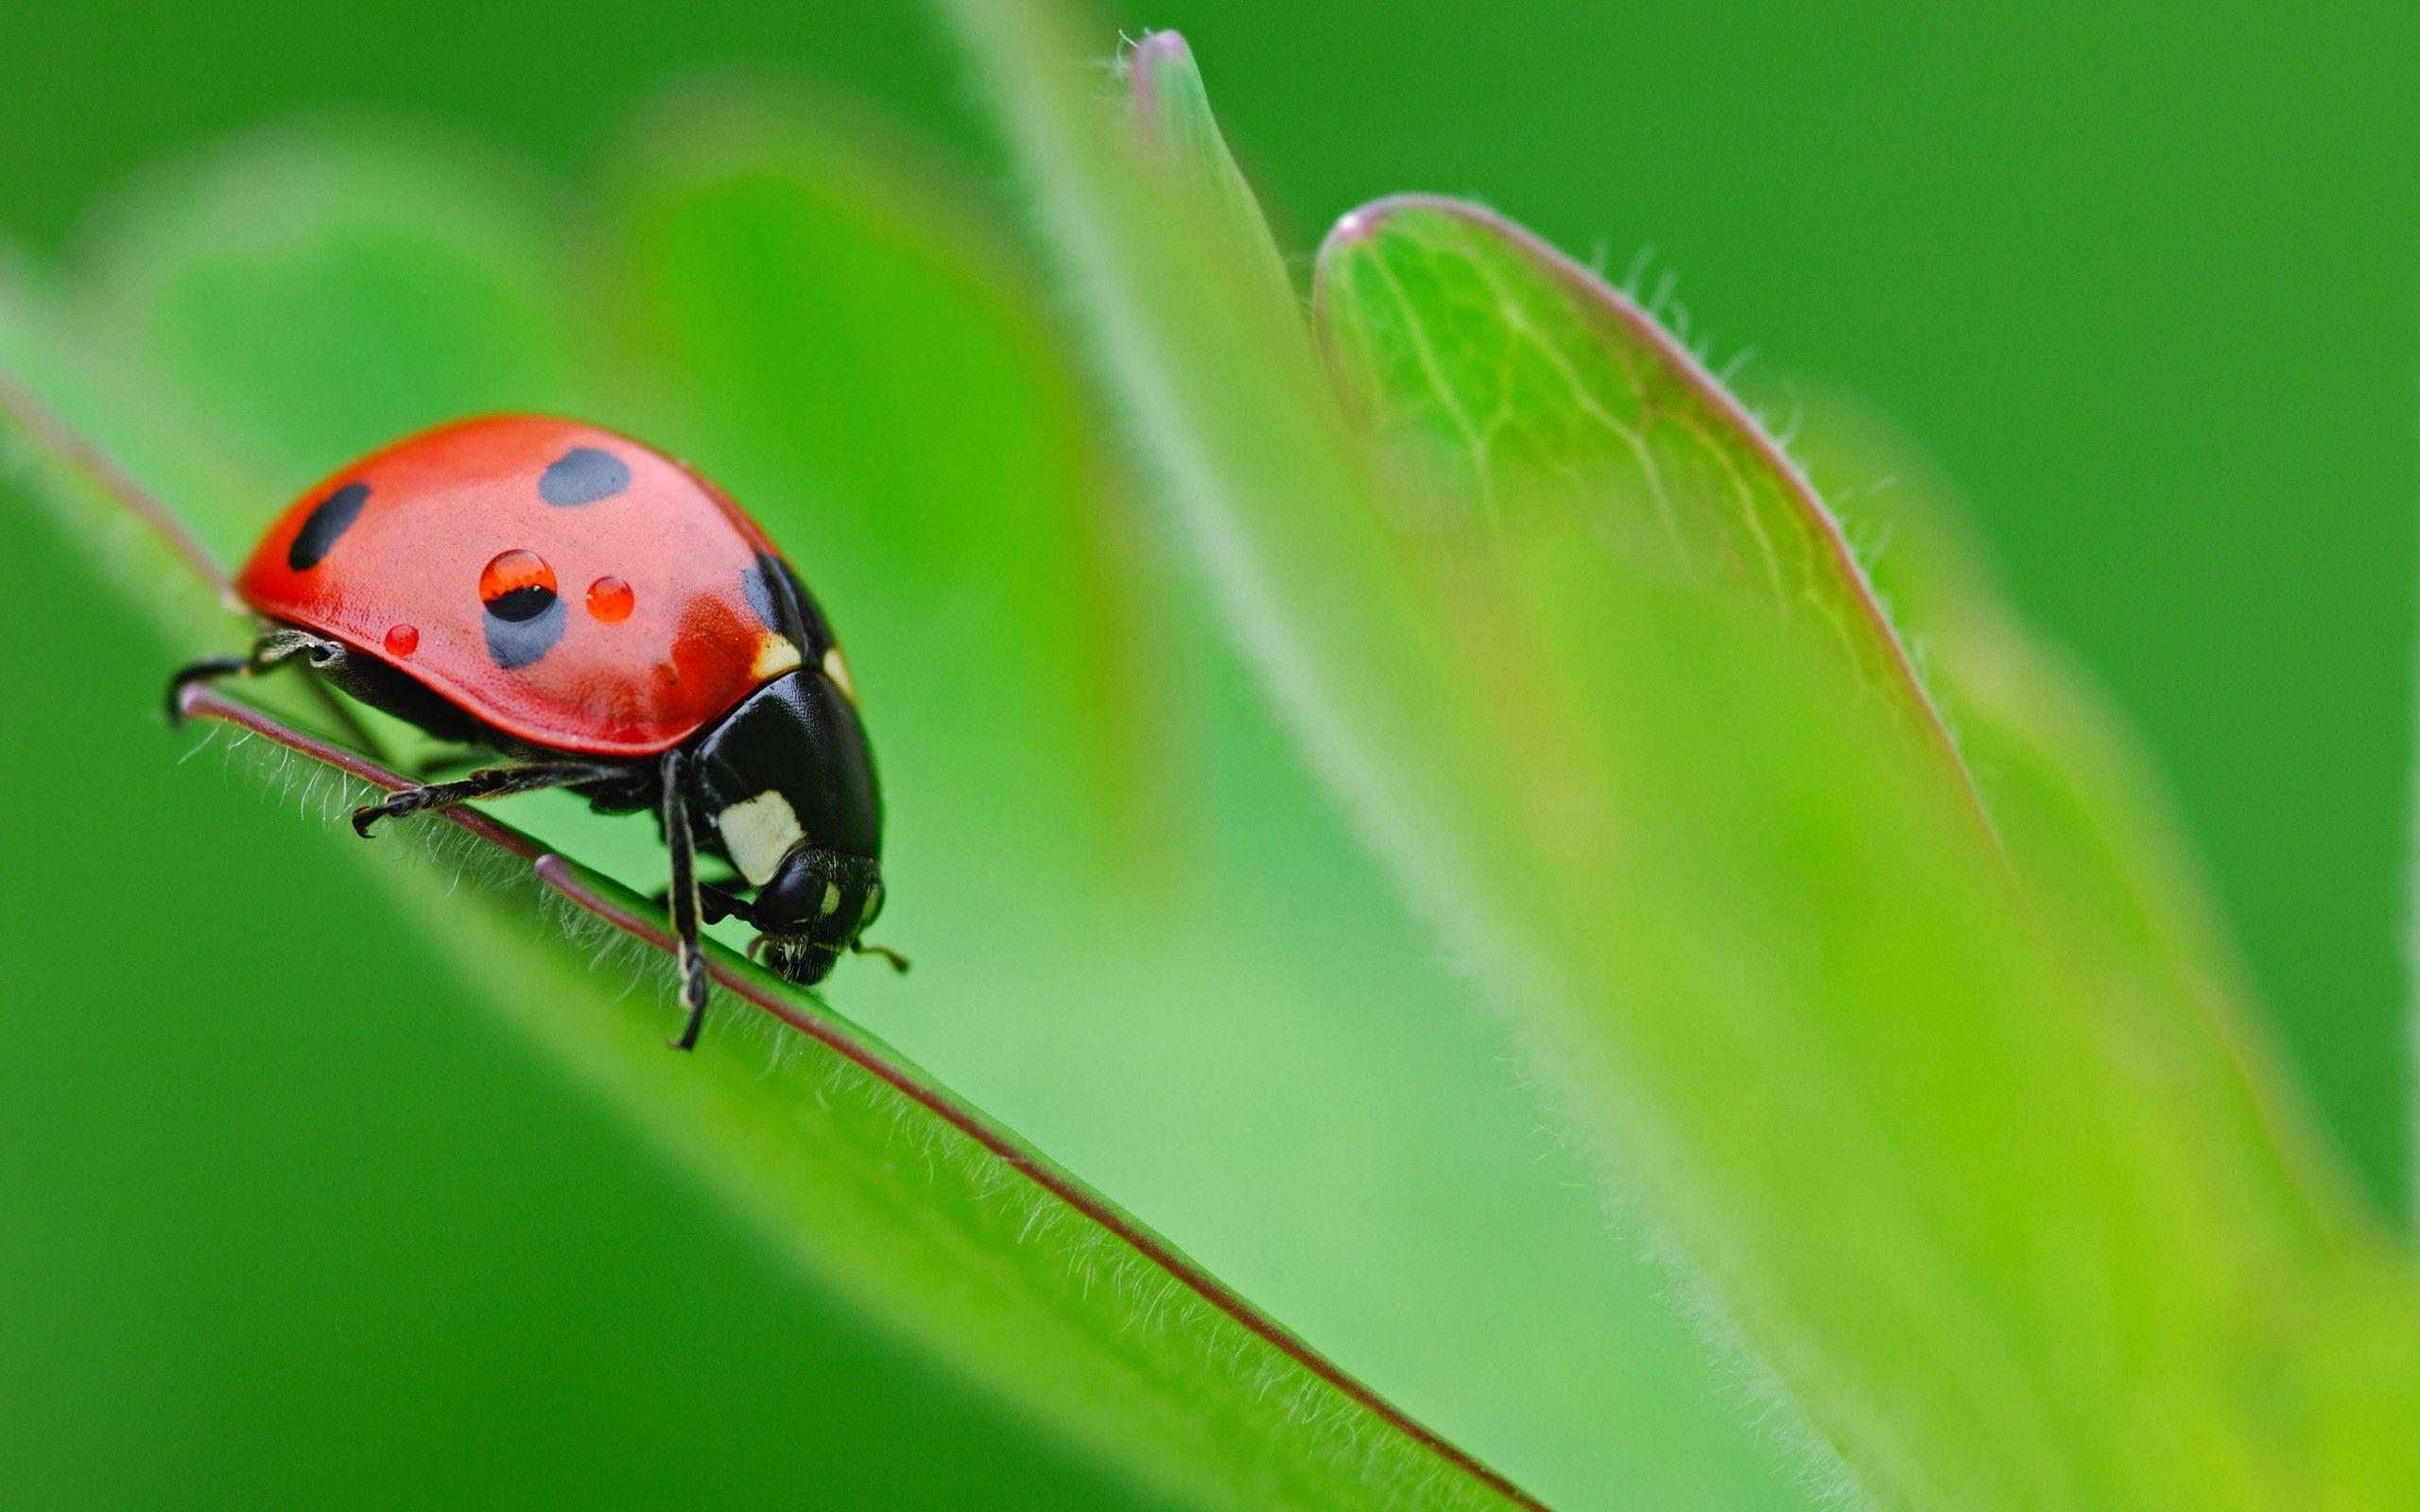 <b>Ladybug</b> on a heart shaped leaf - Macro <b>HD wallpaper</b>